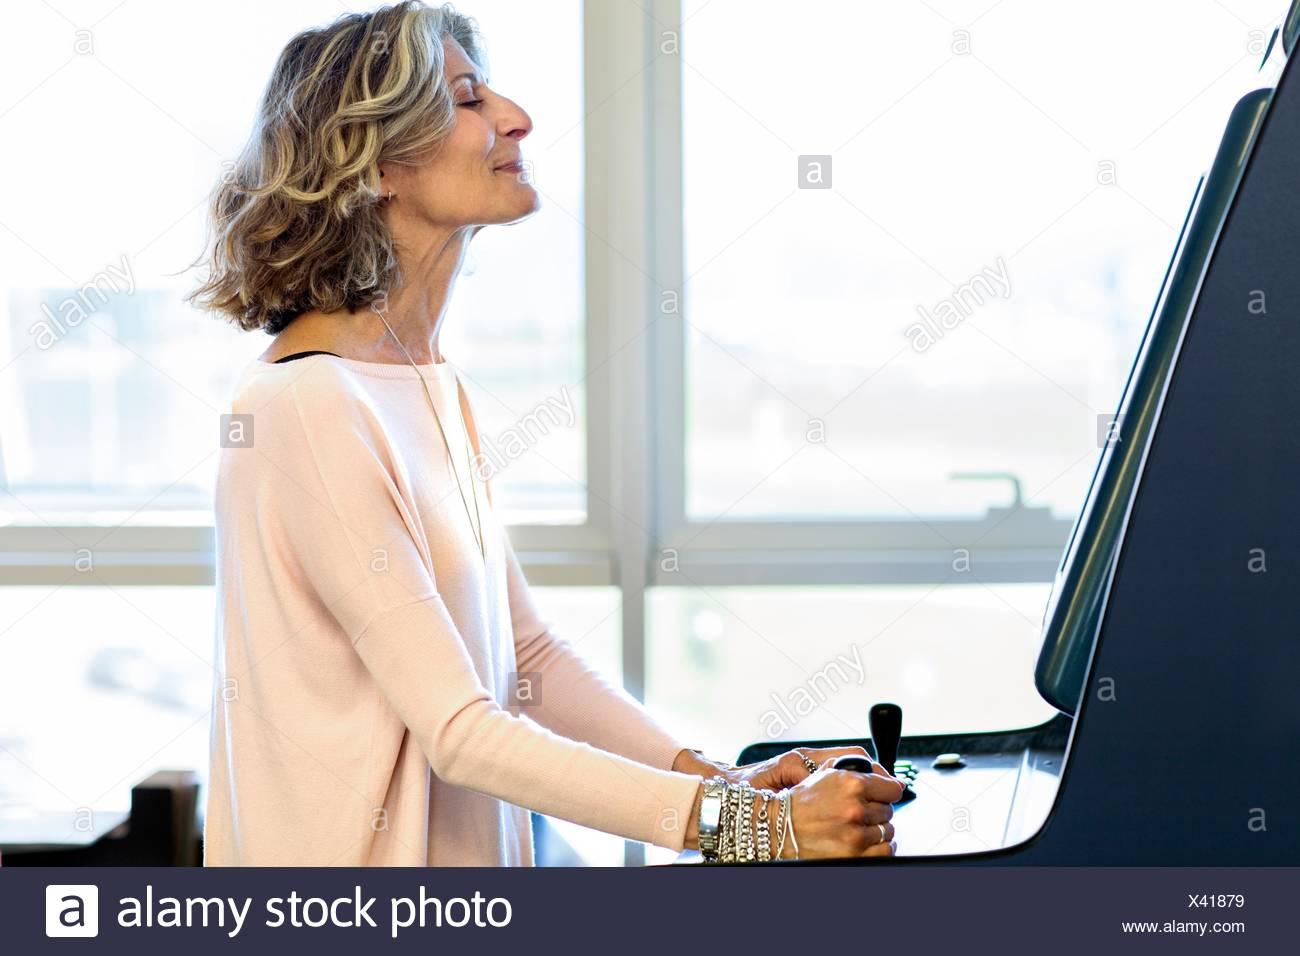 Senior female designer playing on games machine in office - Stock Image